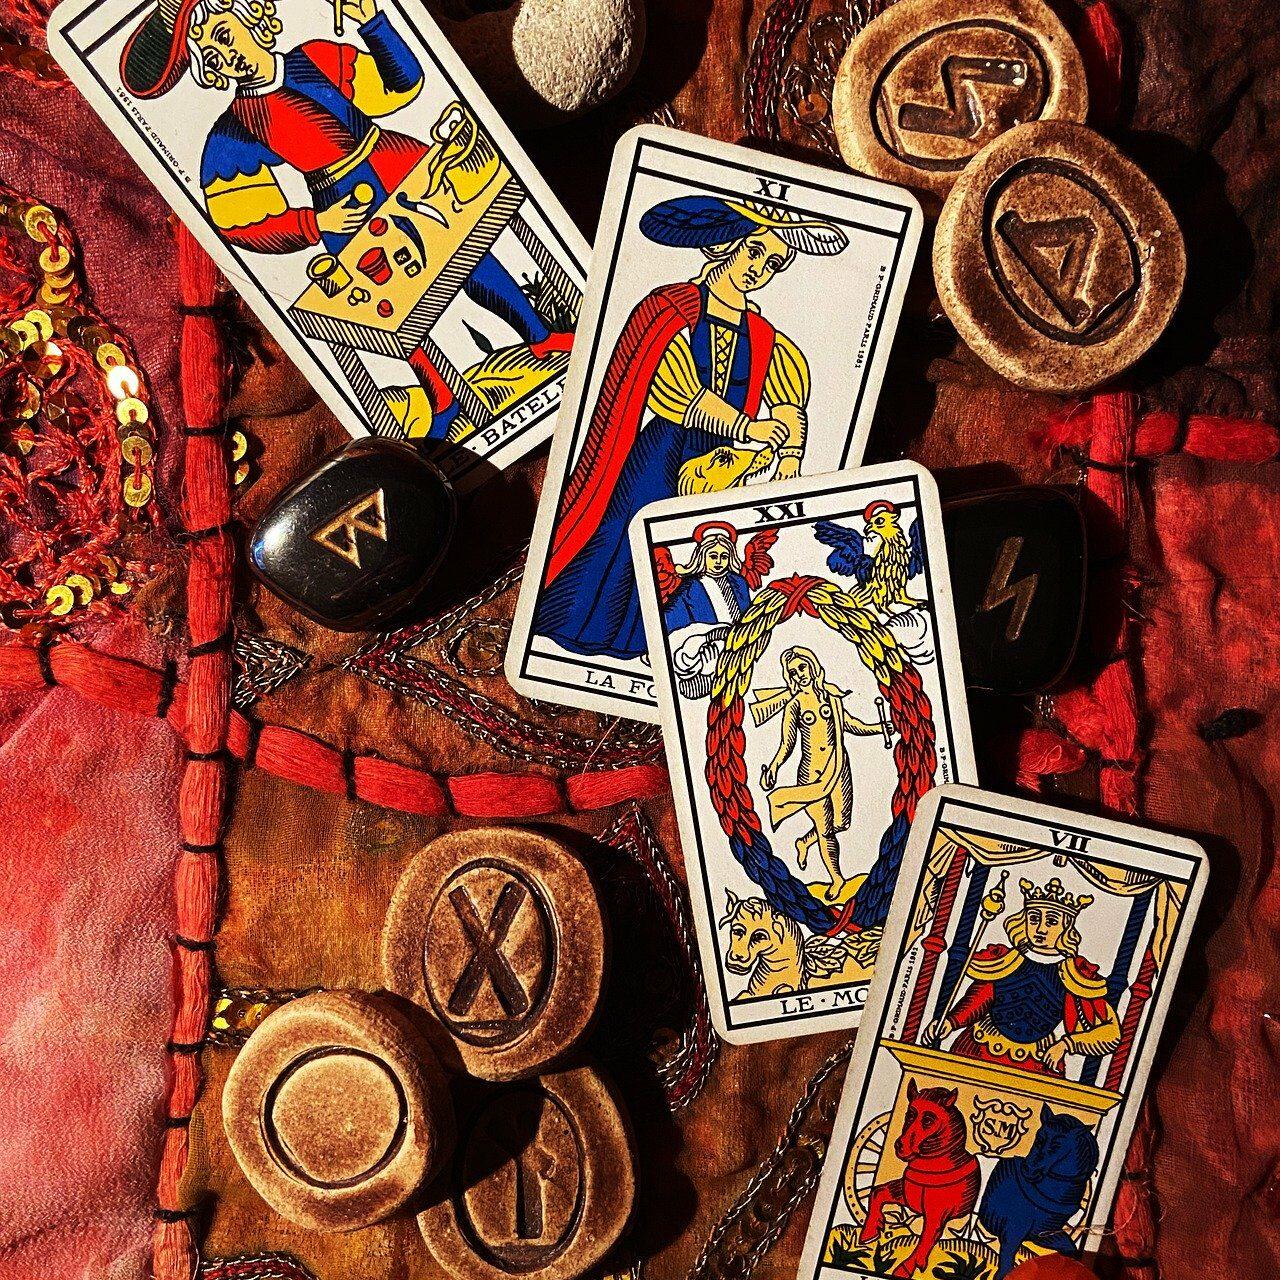 cards-4843641_1920